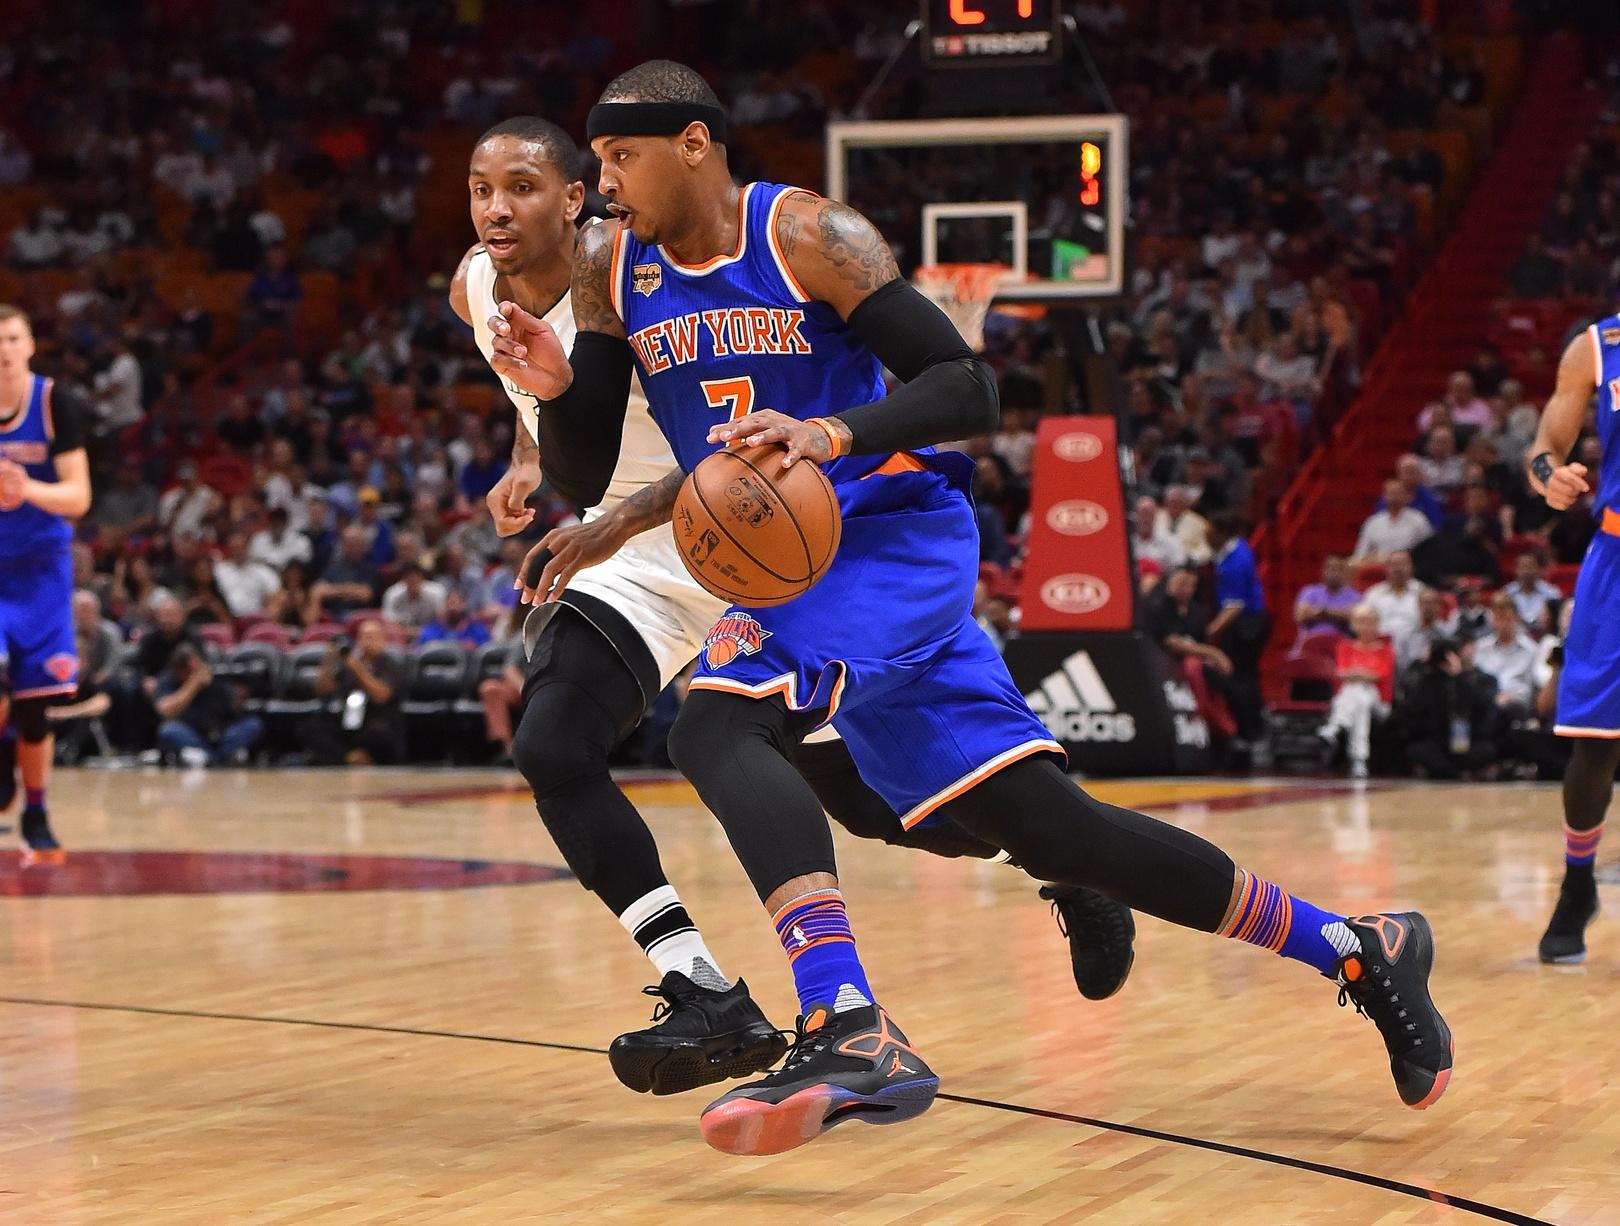 New York Knicks' Carmelo Anthony stars in win over Miami Heat (Highlights)